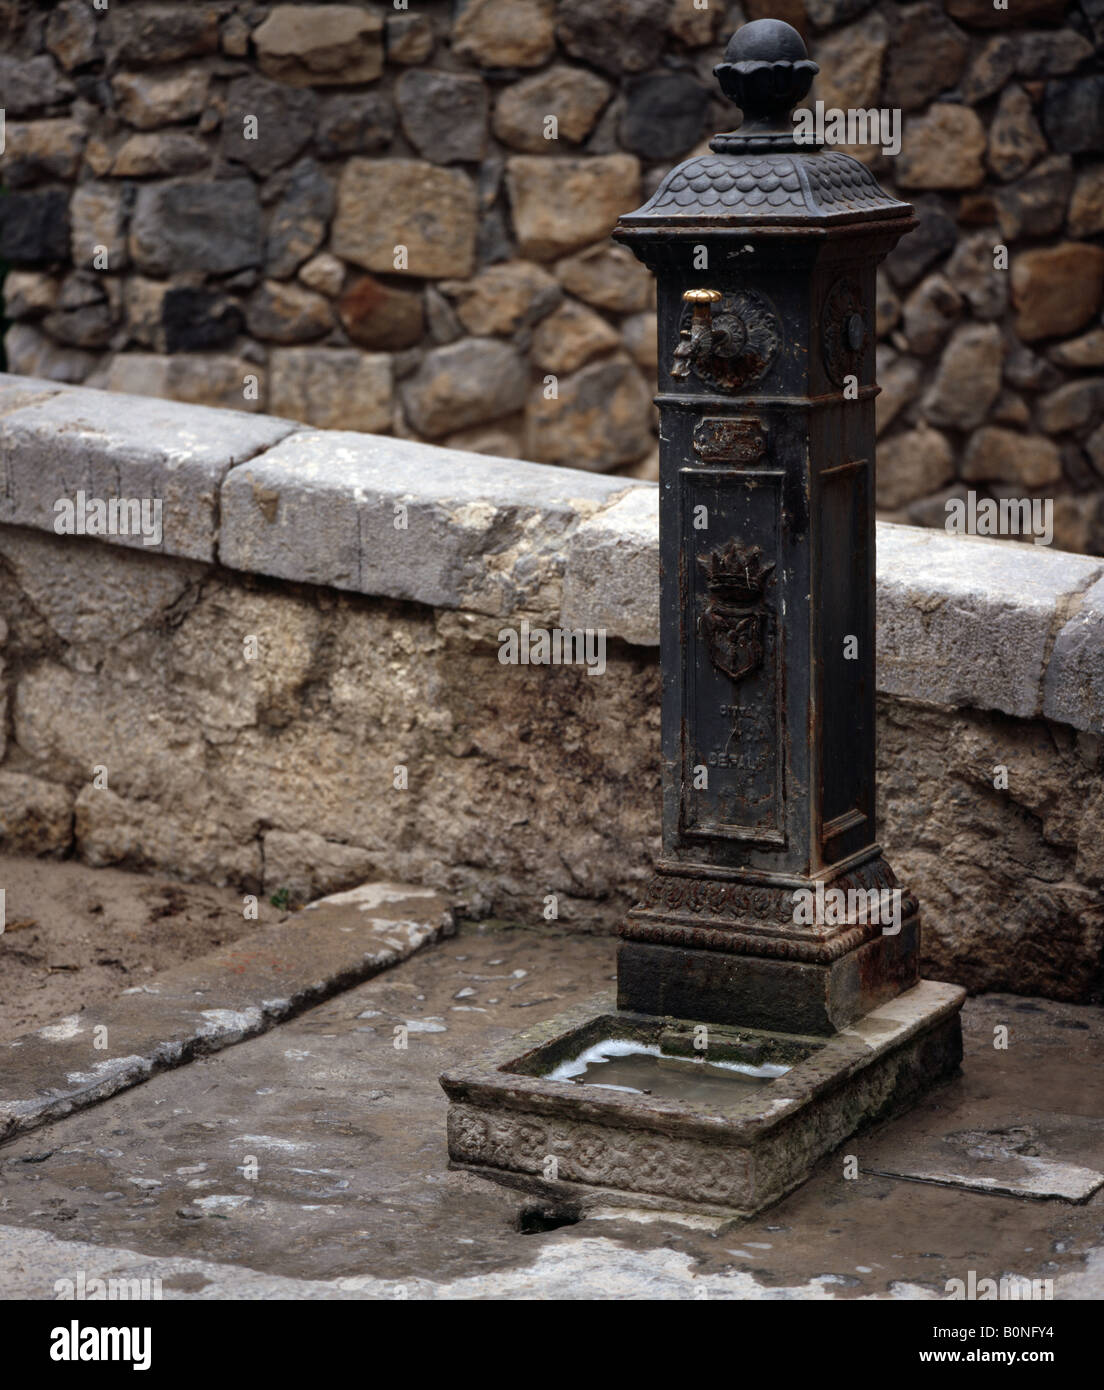 Communal water tap Cefalu Sicily Italy EU - Stock Image